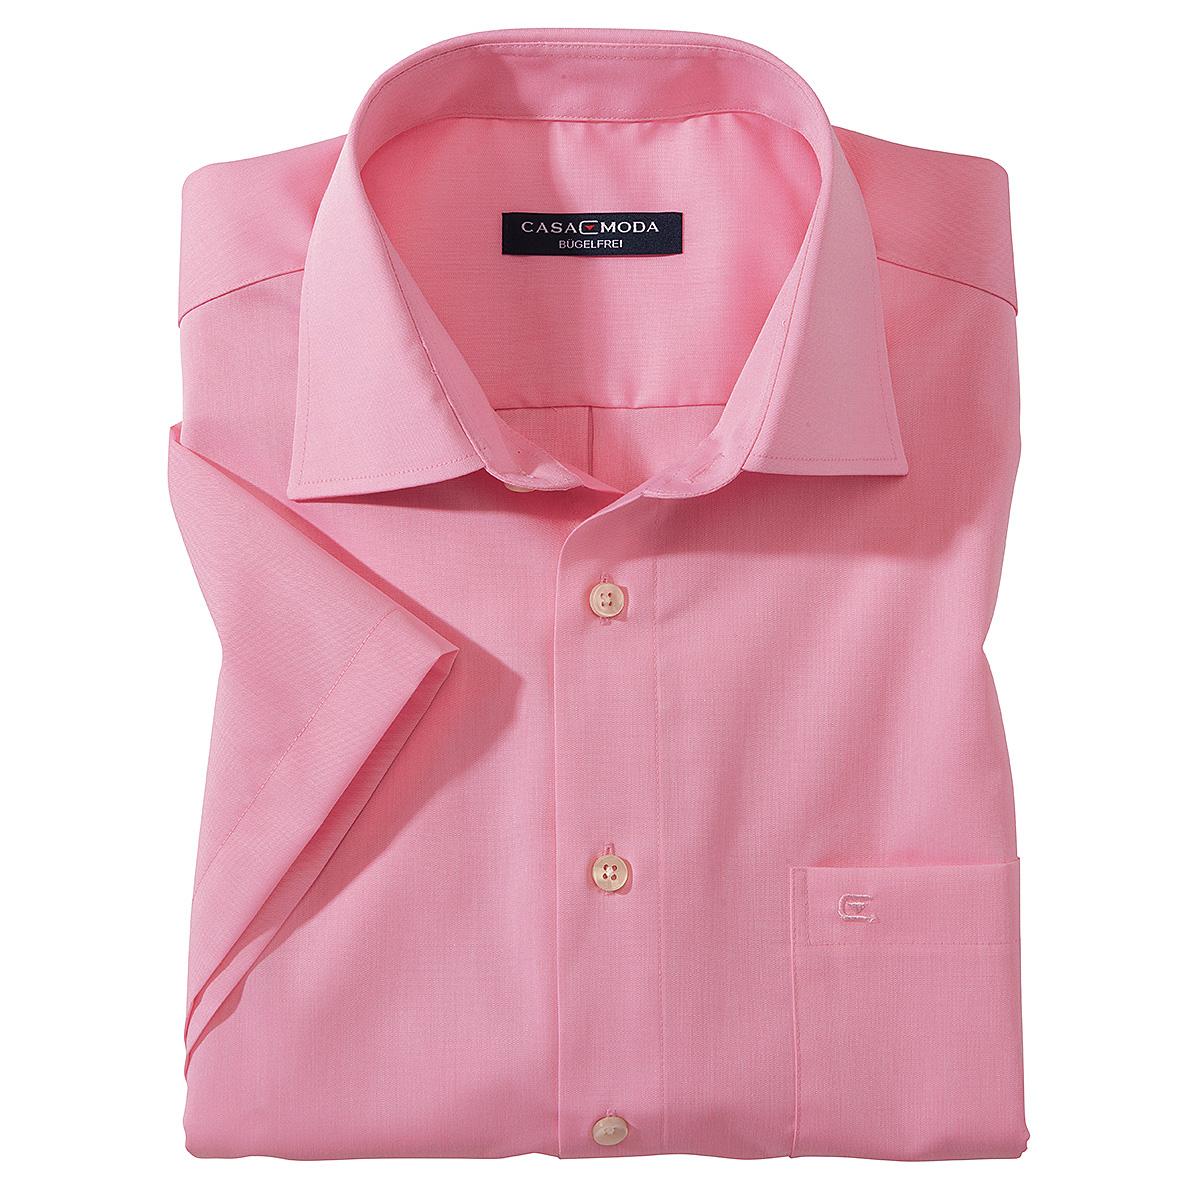 Farbe Korall casa moda city hemd bügelfrei cotton farbe koralle